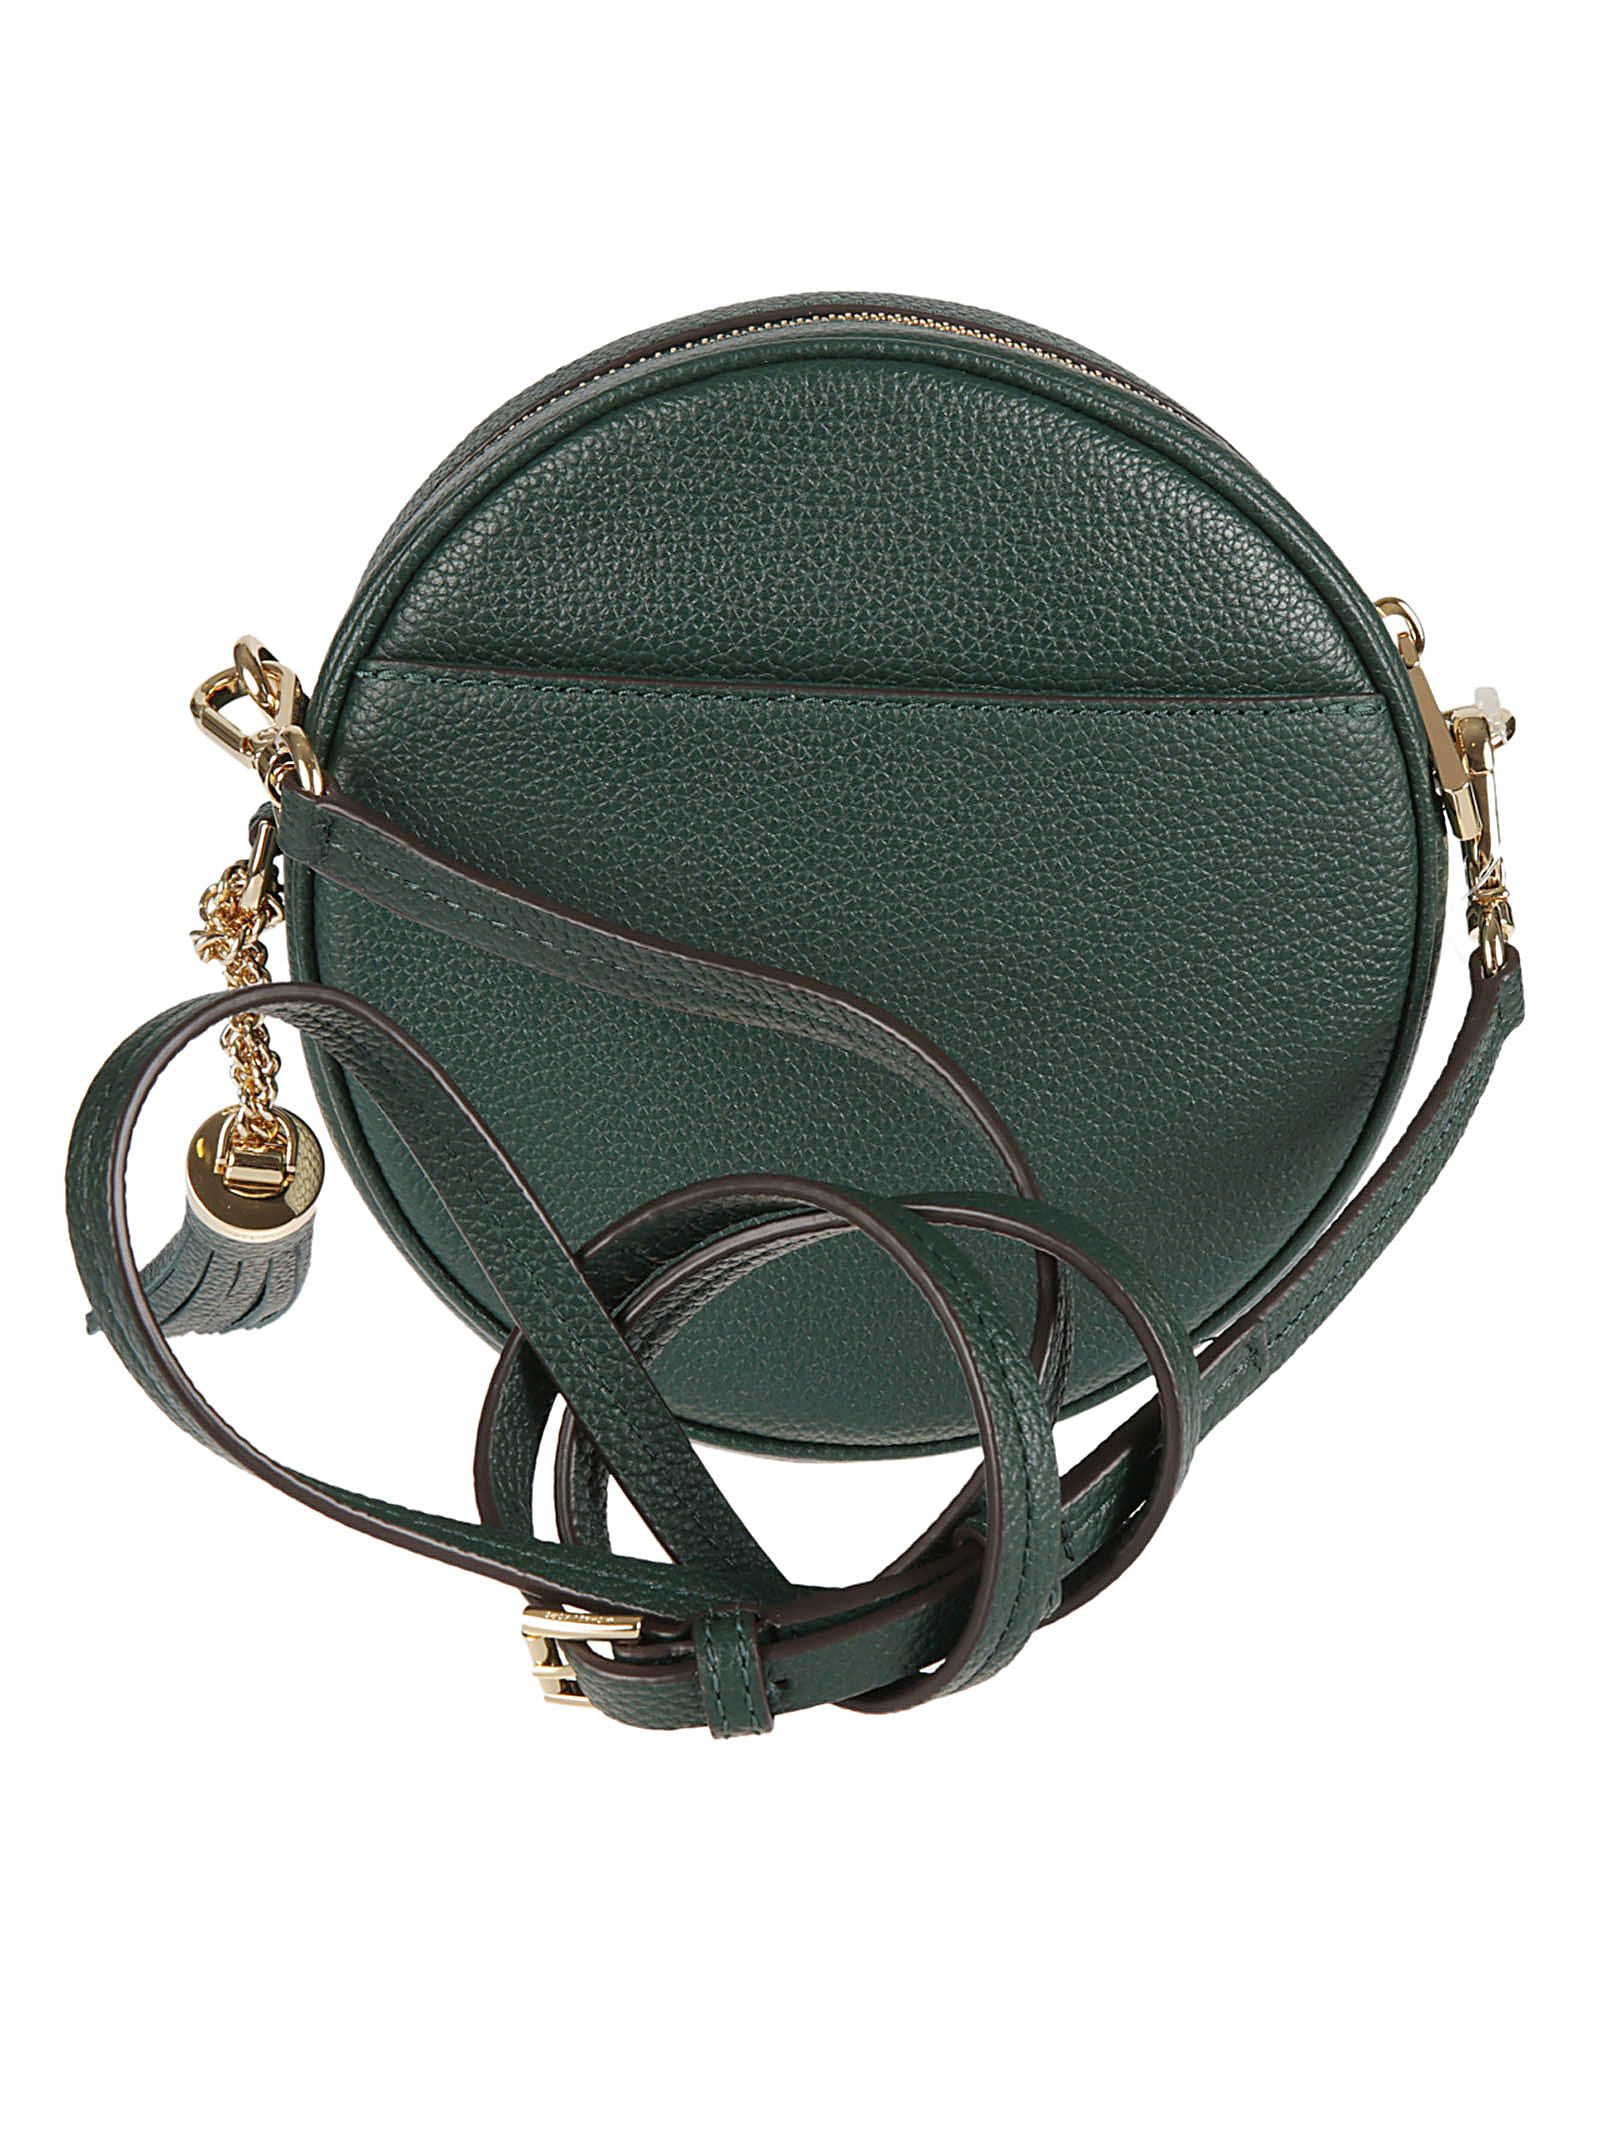 513f0ada49 Michael Kors Michael Kors Mercer Crossbody Bag - Basic - 10801899 ...